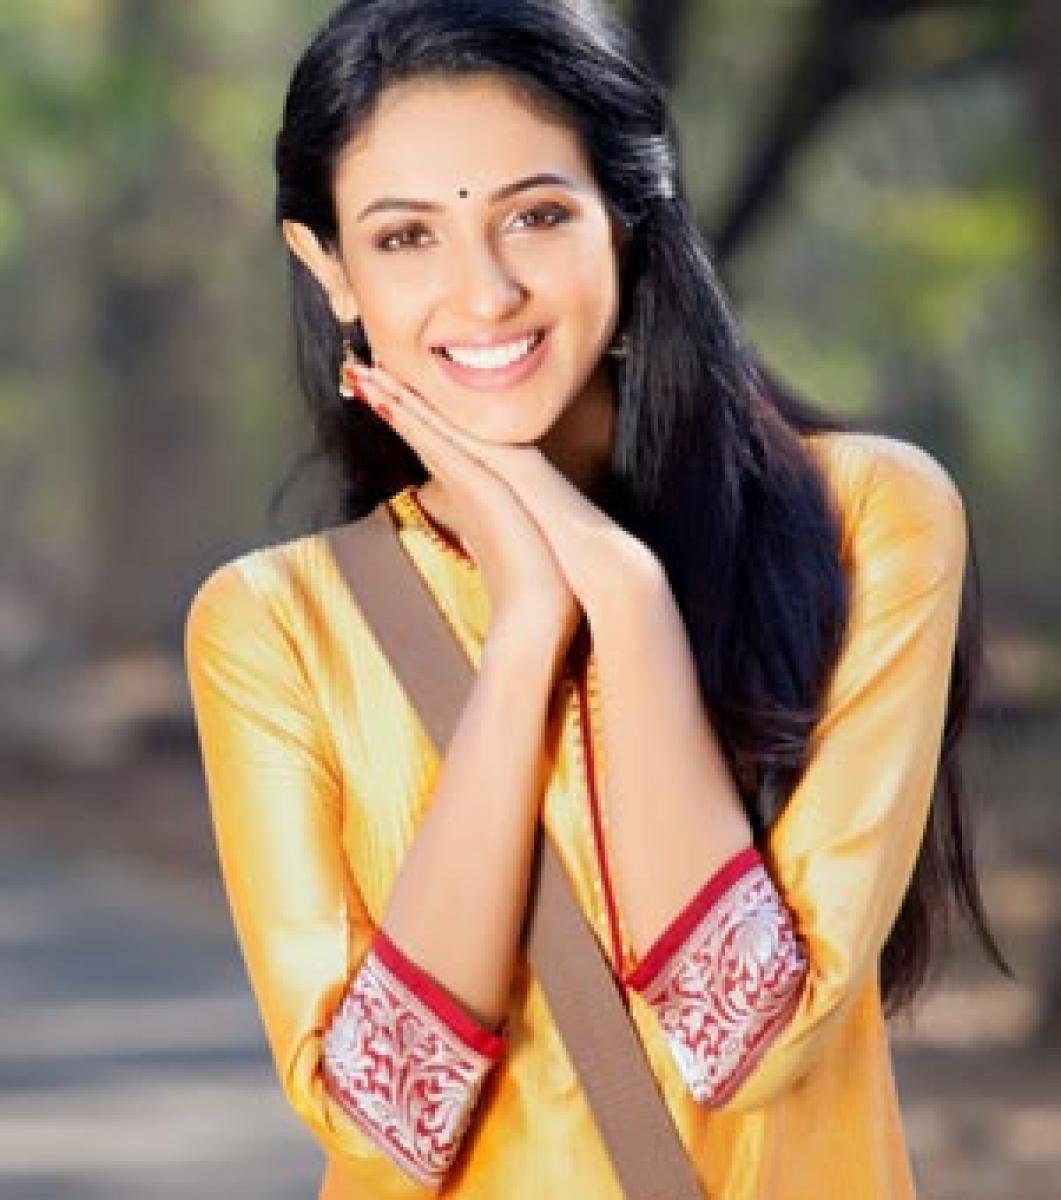 Shri Priya to romance Nani